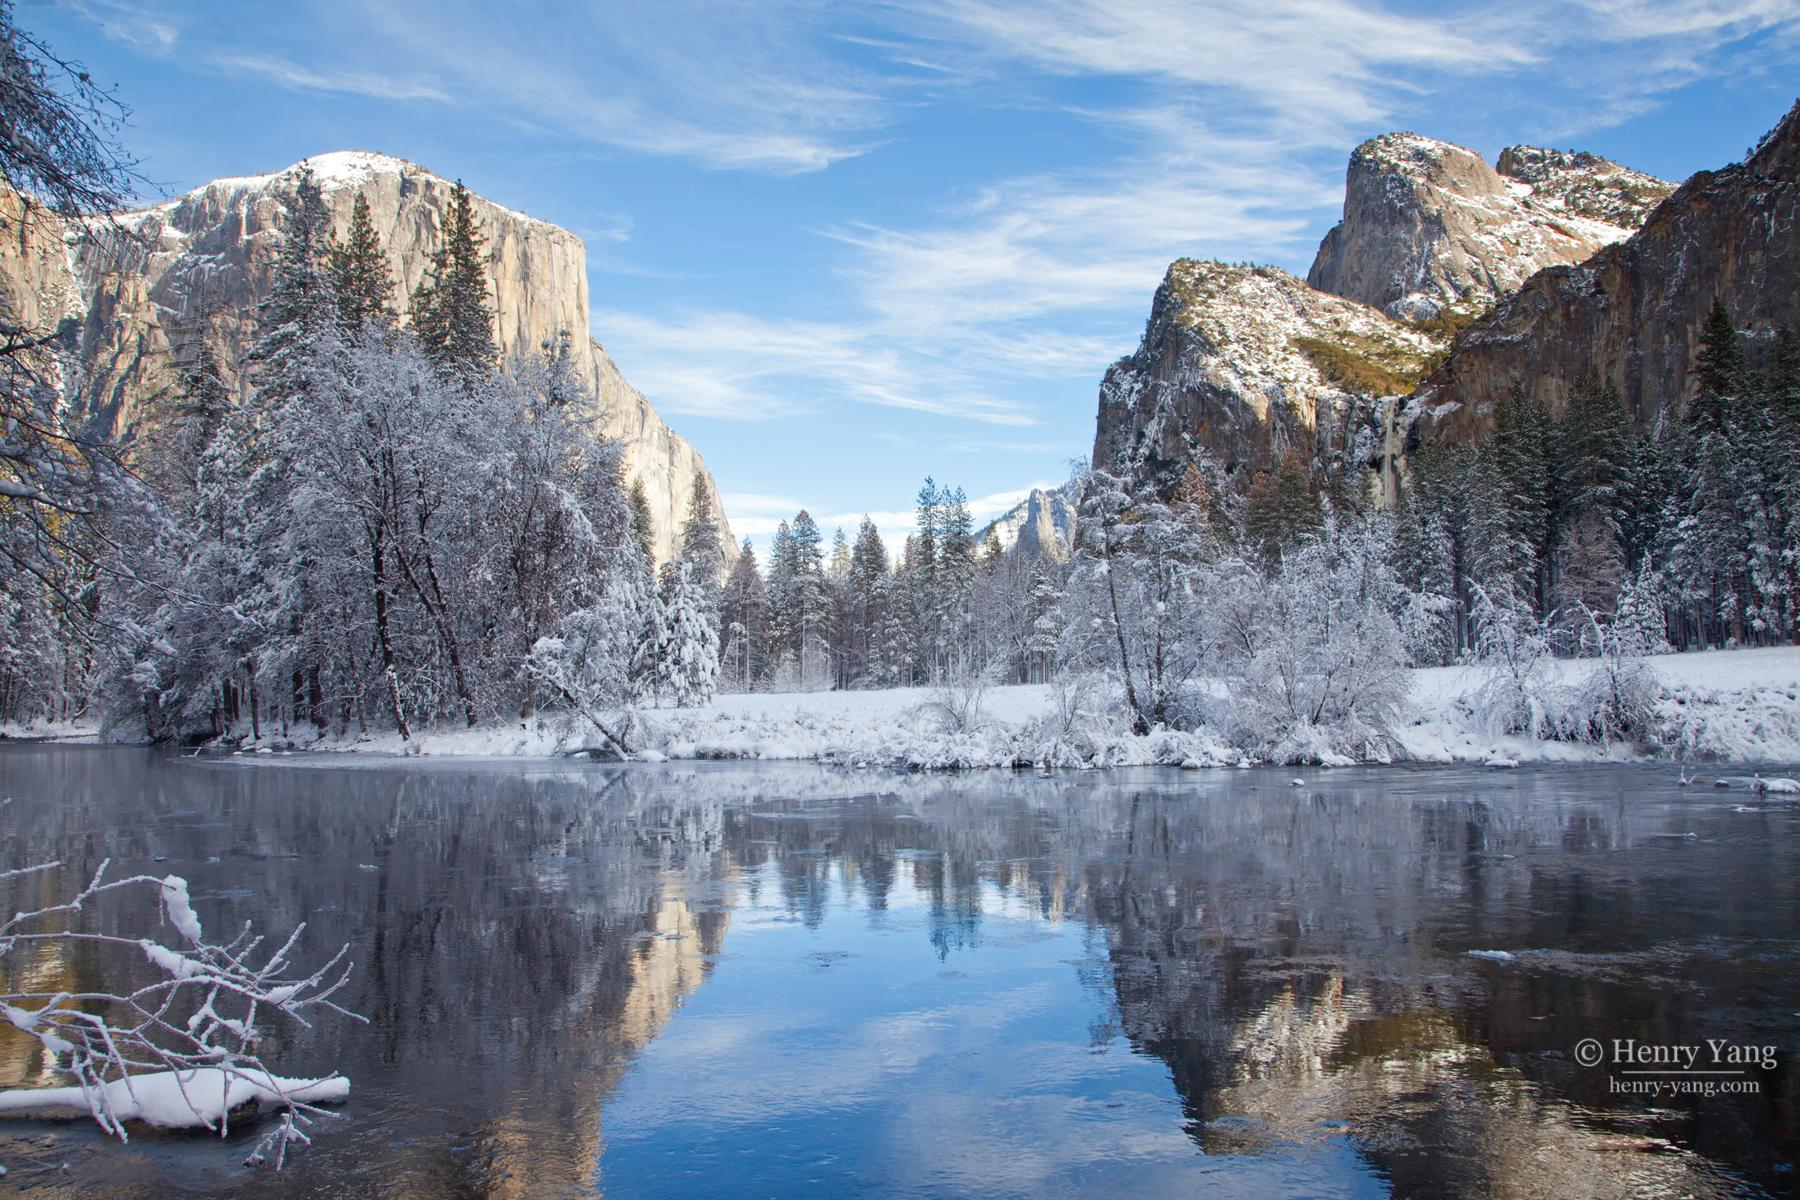 Winter Scenes, Yosemite National Park, California - Henry